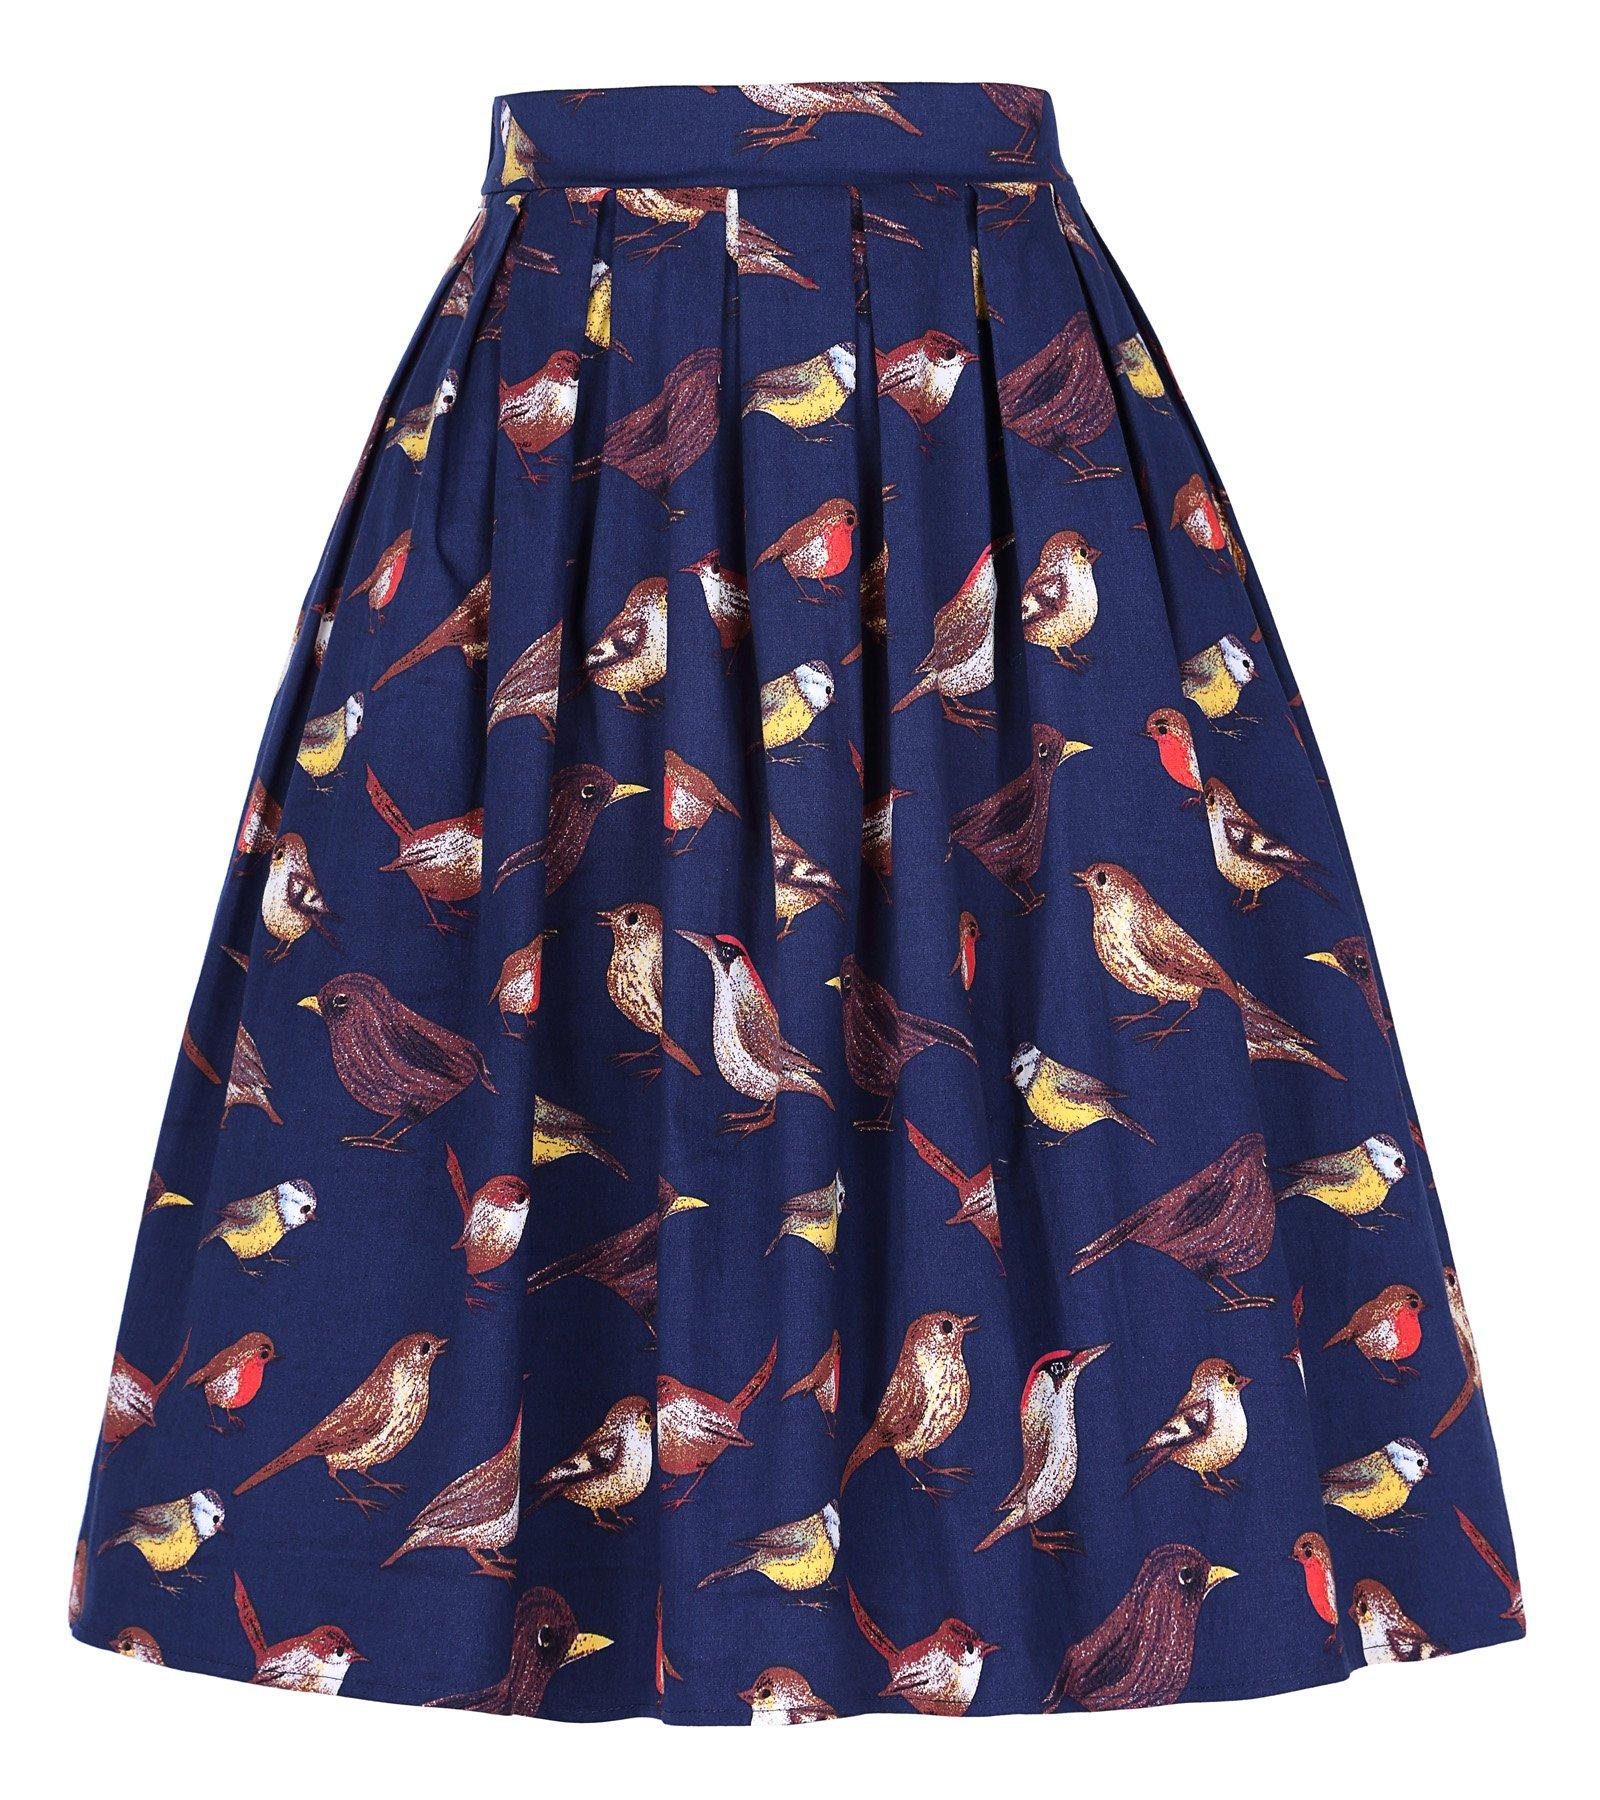 Grace Karin Women Pleated Vintage Skirts Floral Print